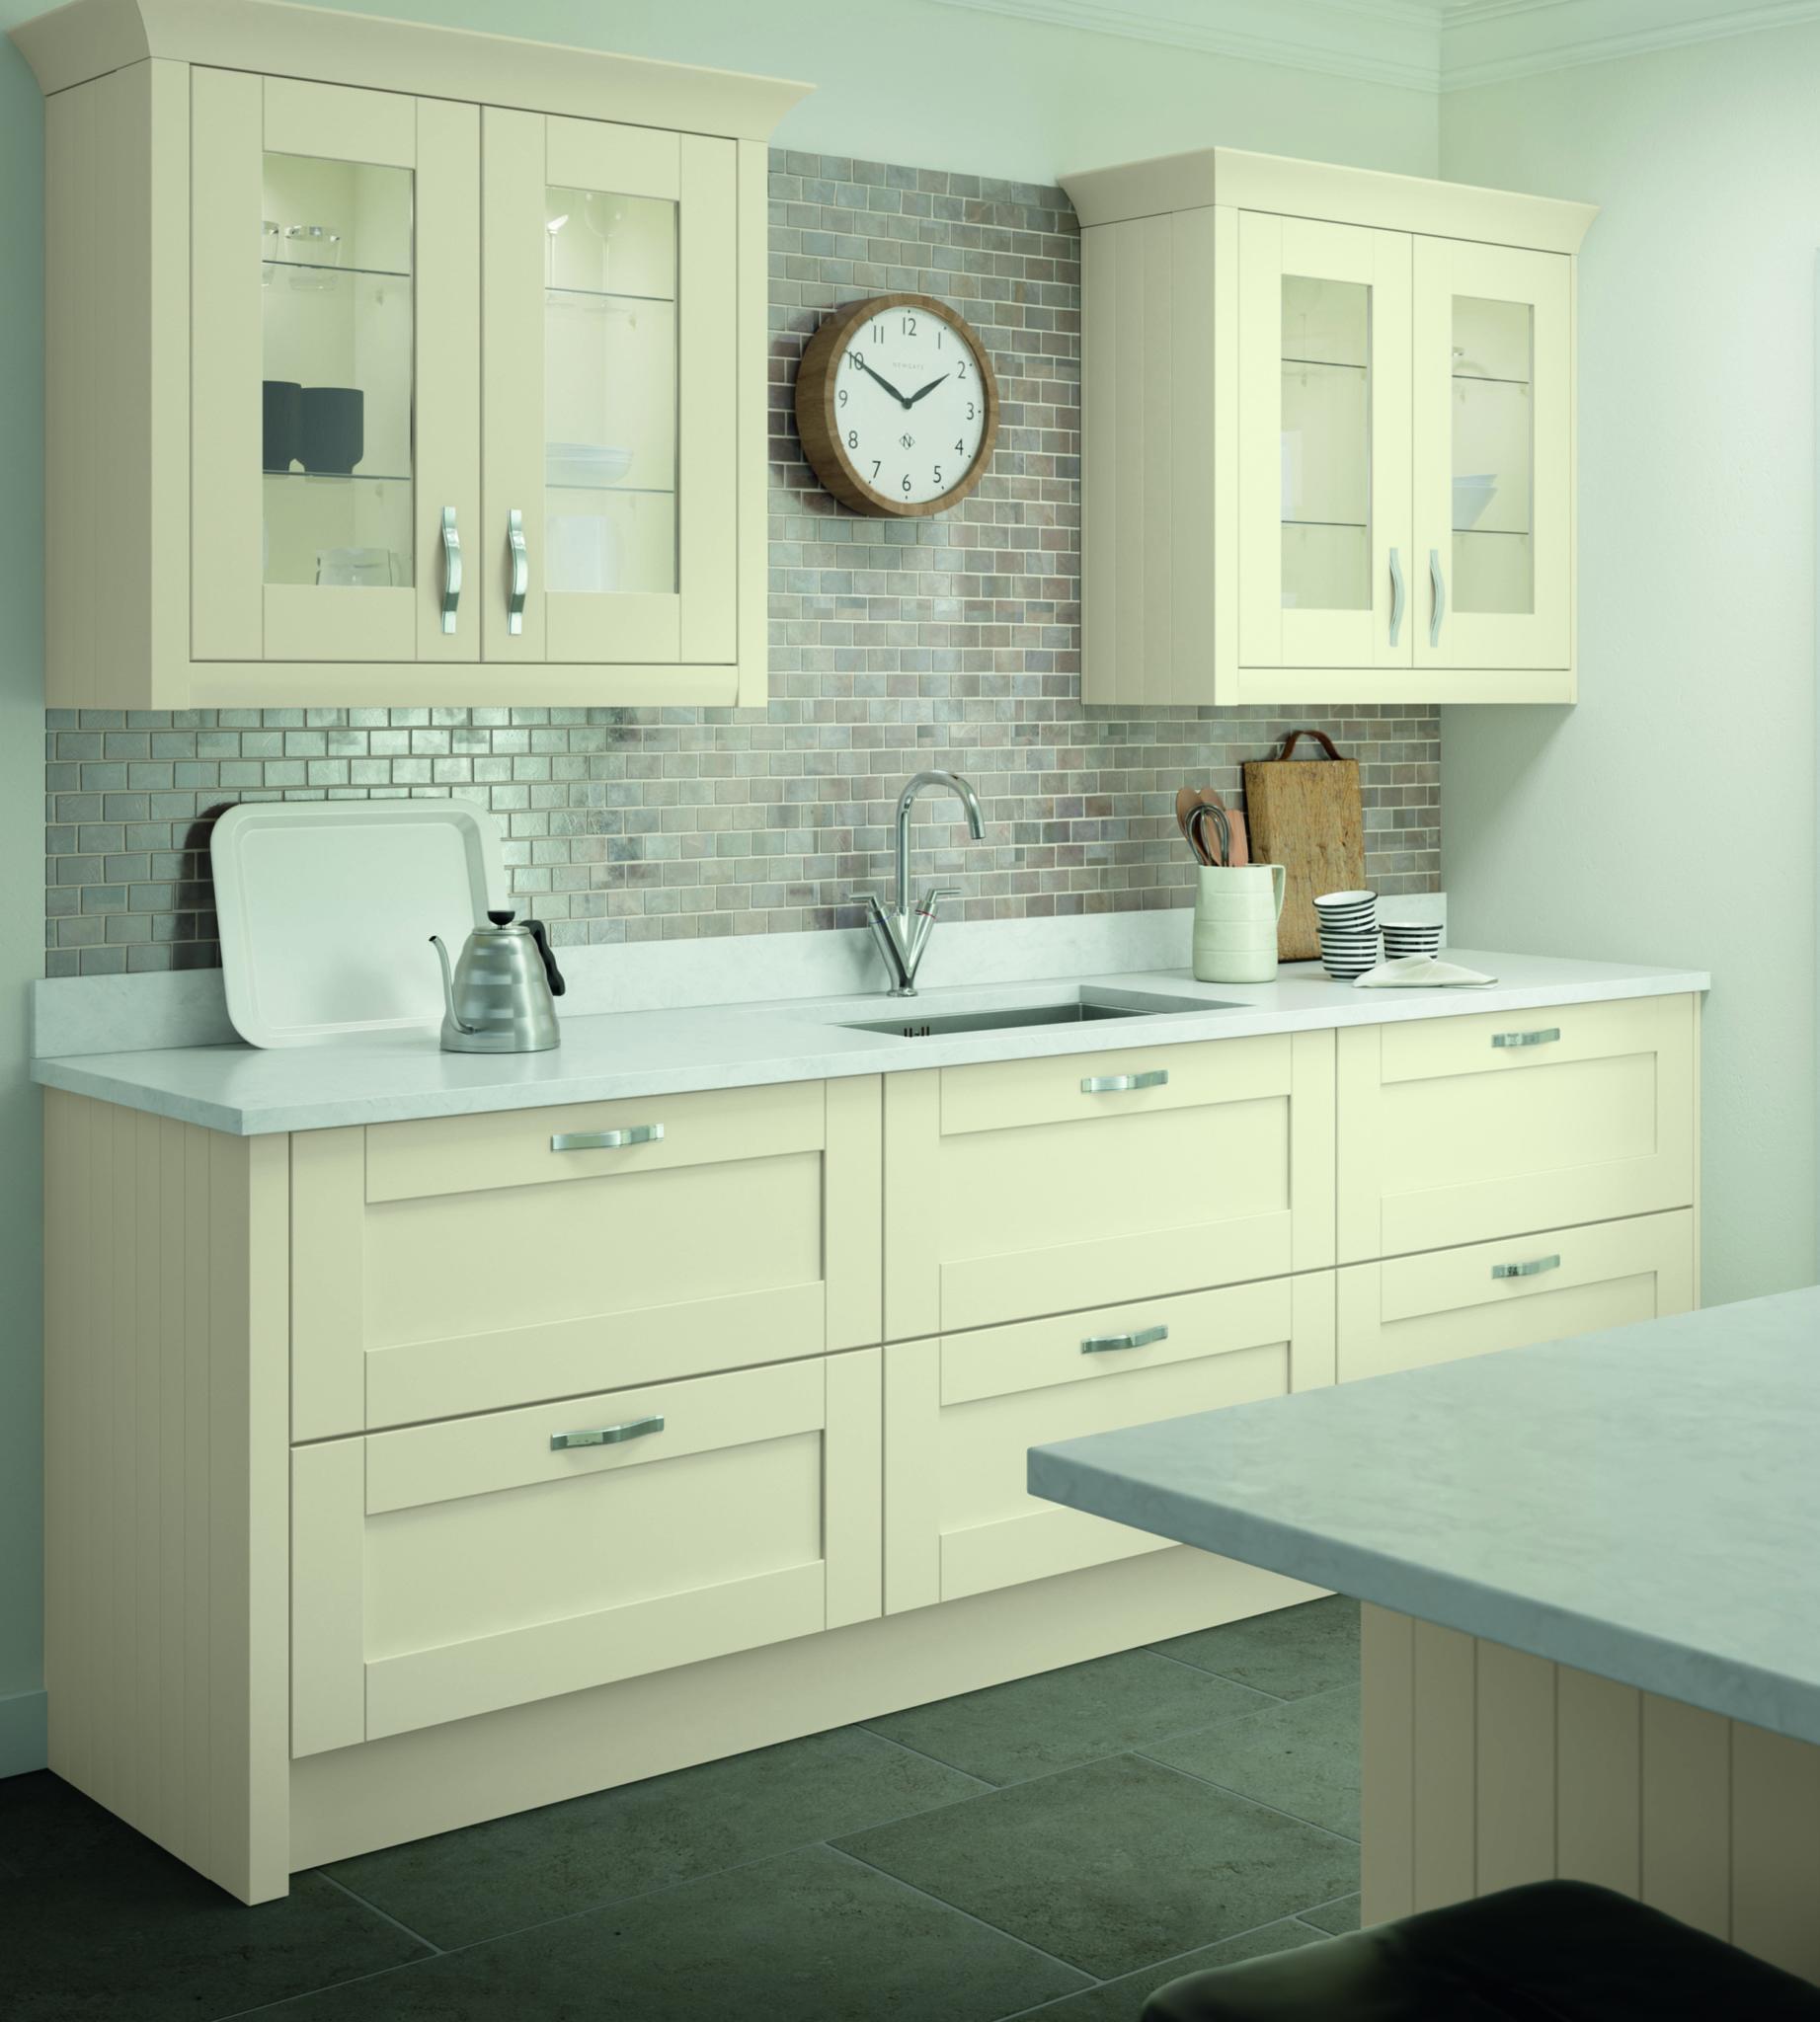 Shaker Style Cabinet Doors: Shaker Style Kitchen Cabinet Doors